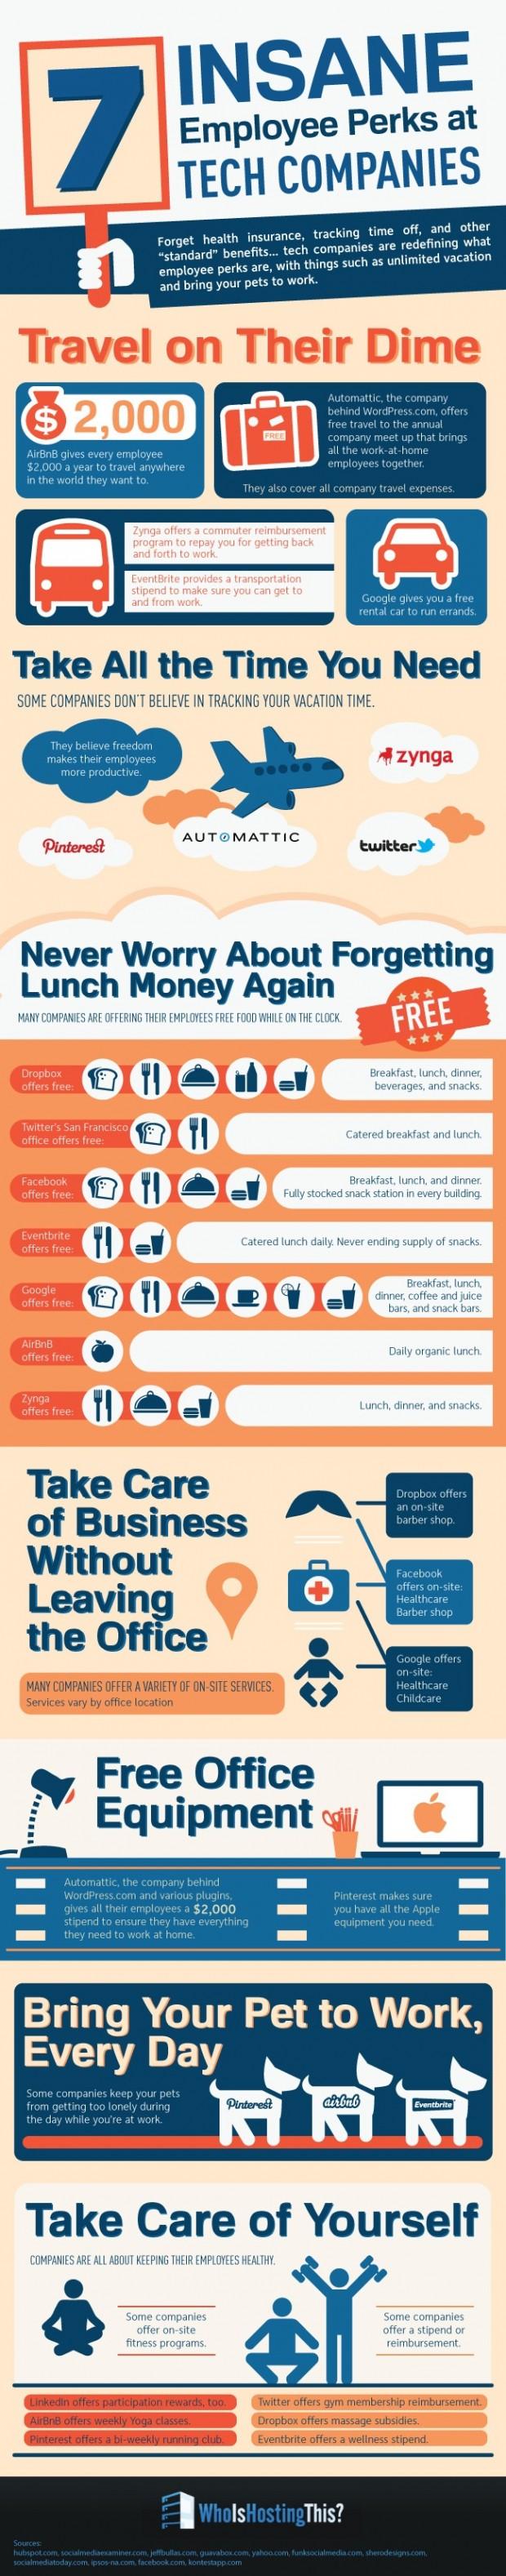 7-insane-employee-perks-at-tech-companies-infograph